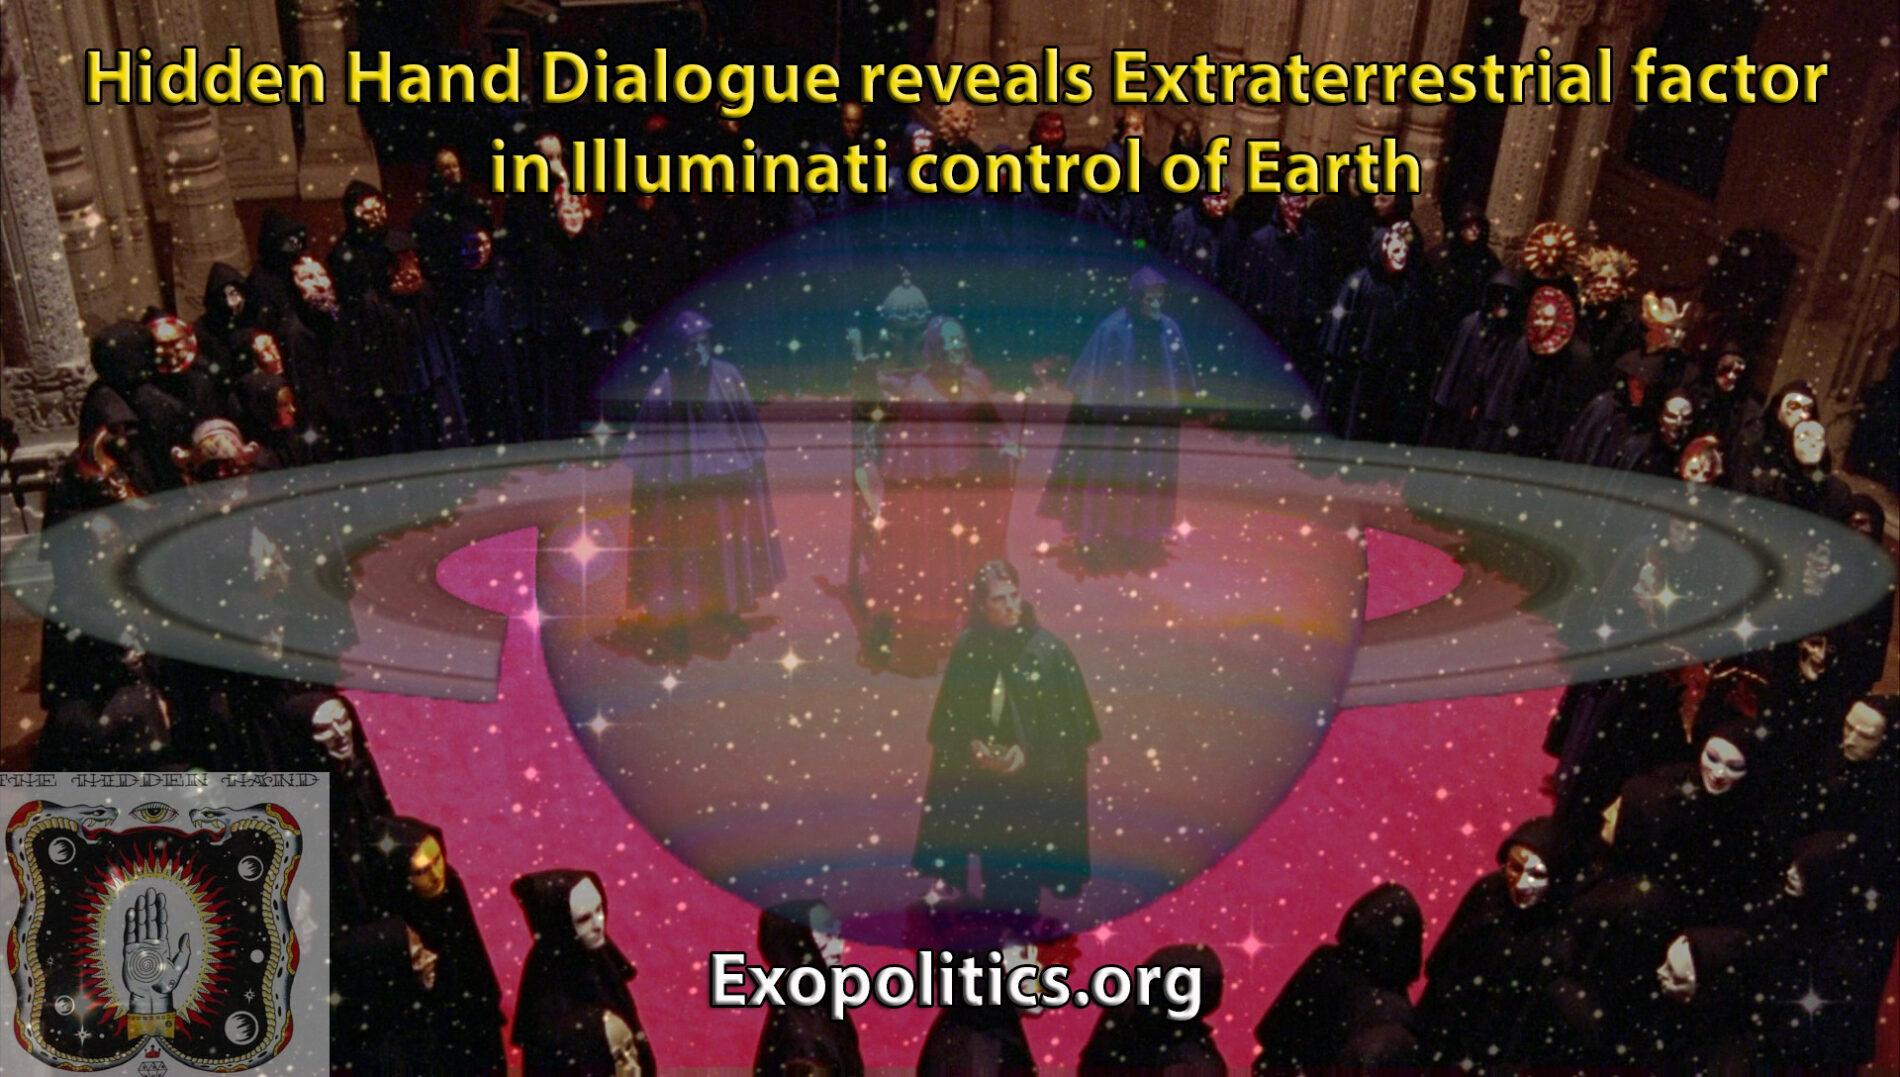 https://i0.wp.com/exopolitics.org/wp-content/uploads/2016/04/Hidden-Hand-Illuminati-Family-1.jpg